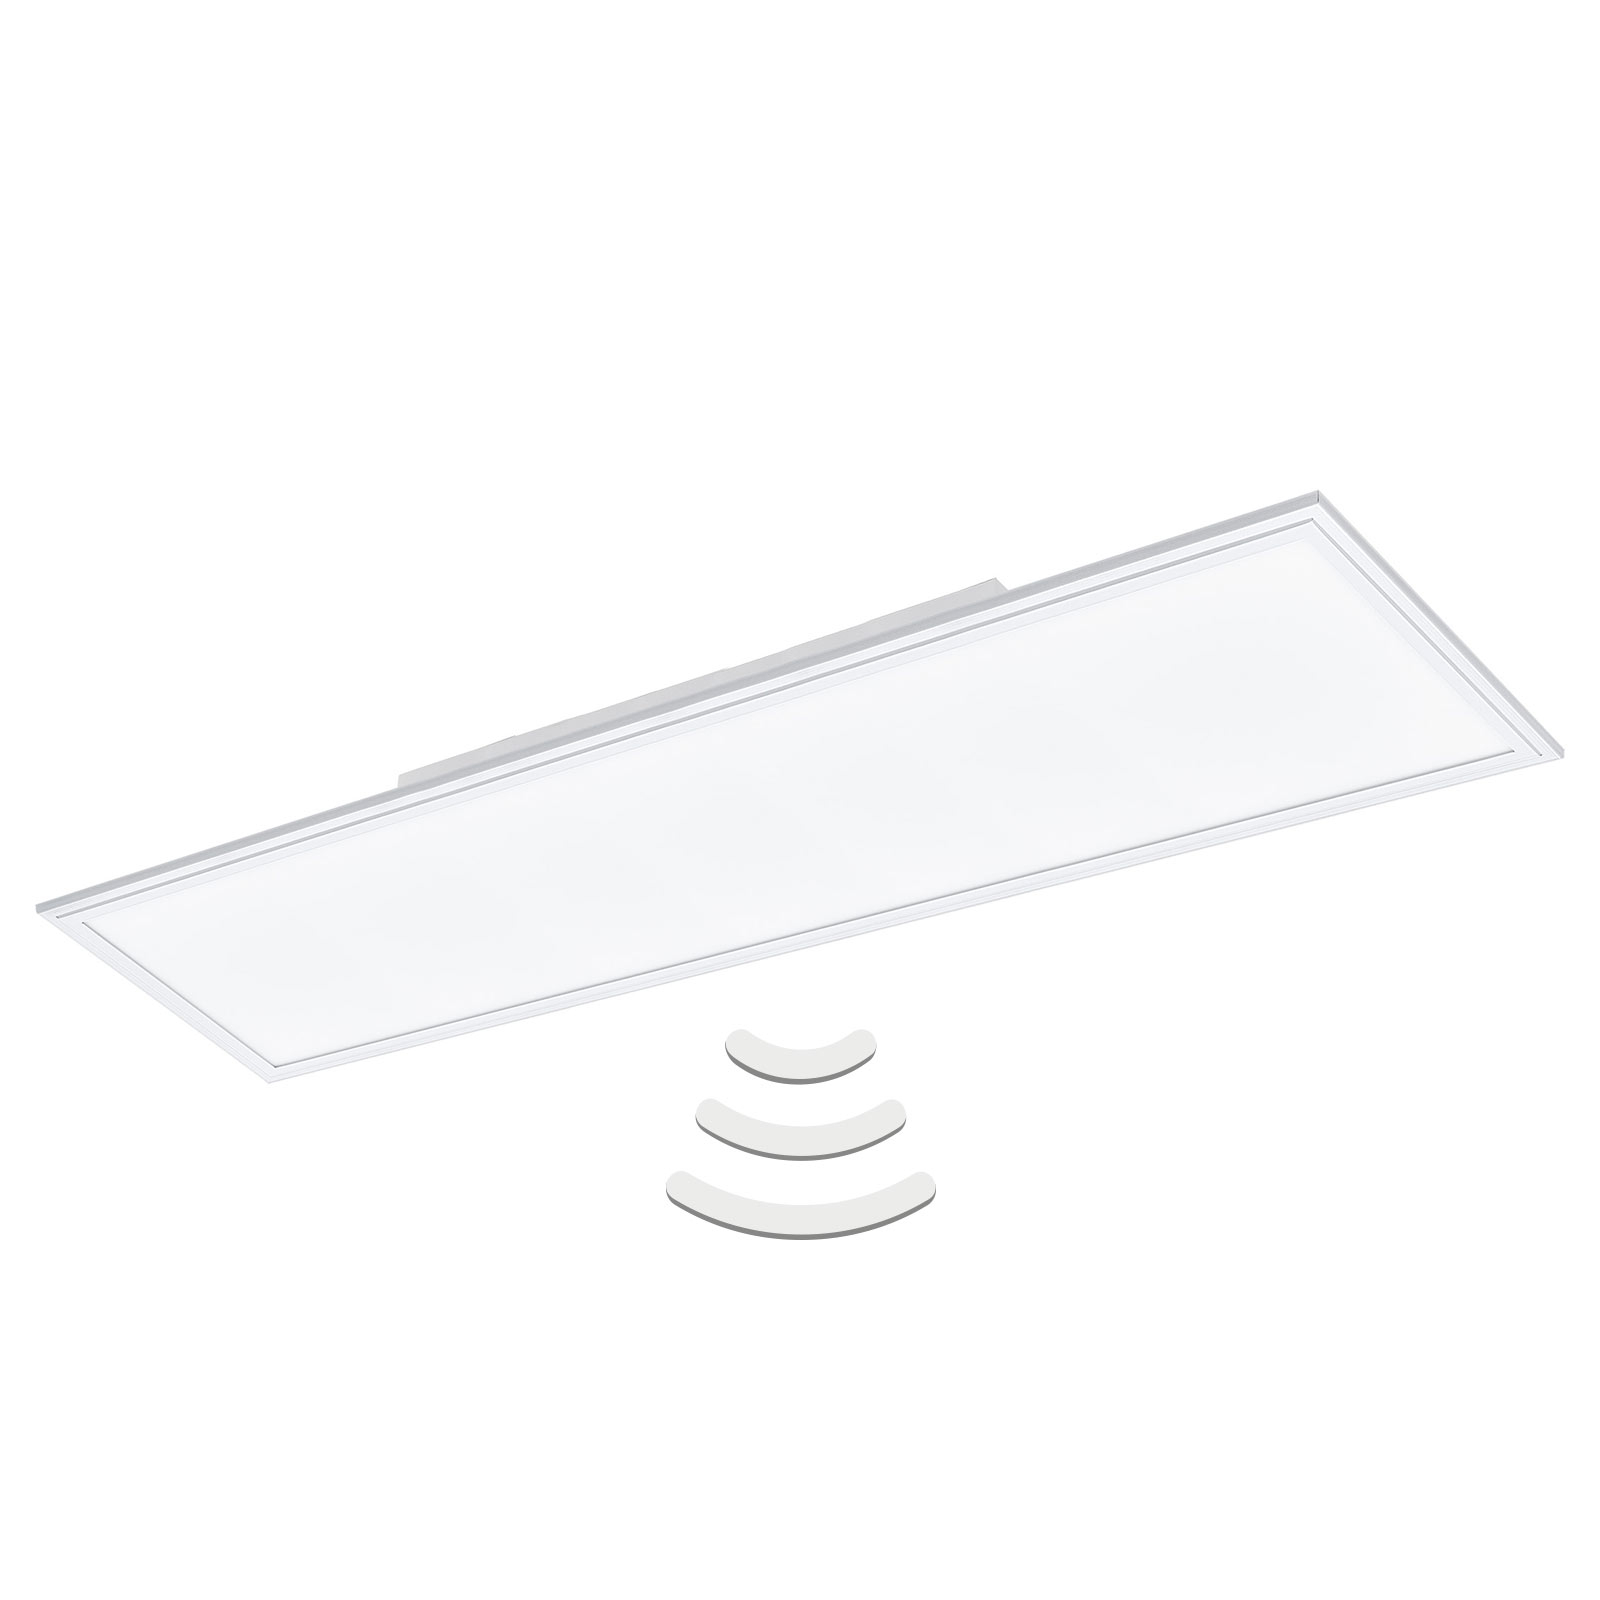 Lampa sufitowa LED Salobrena-M 119,5x29,5cm